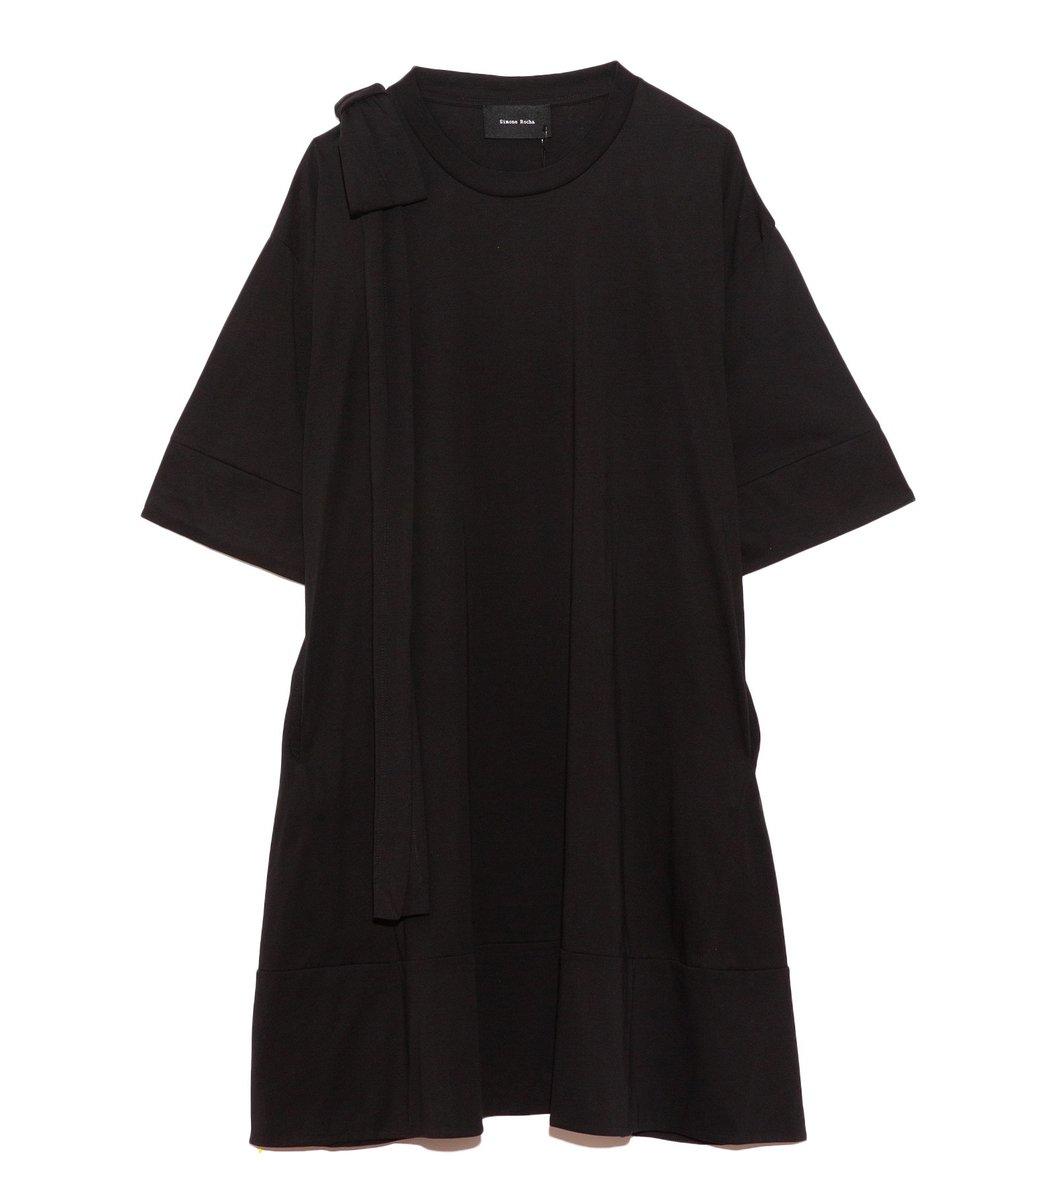 Simone Rocha Shoulder Bow Tunic Dress in Black